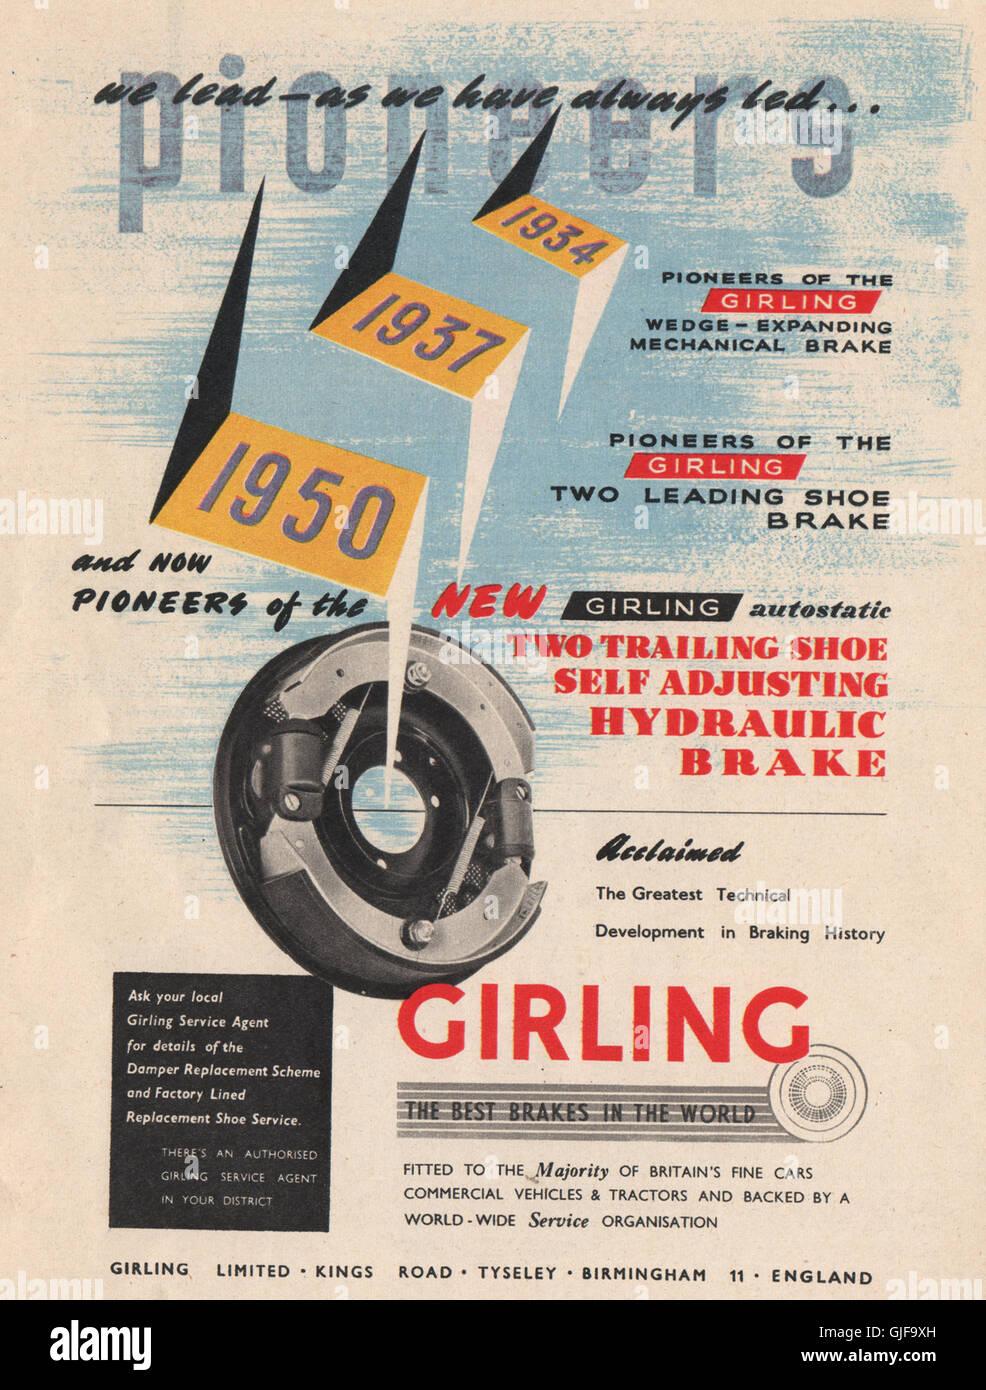 ENGINEERING-ANZEIGE. Girling, Ltd Bremsen. , Jahrgang 1951 drucken Stockbild